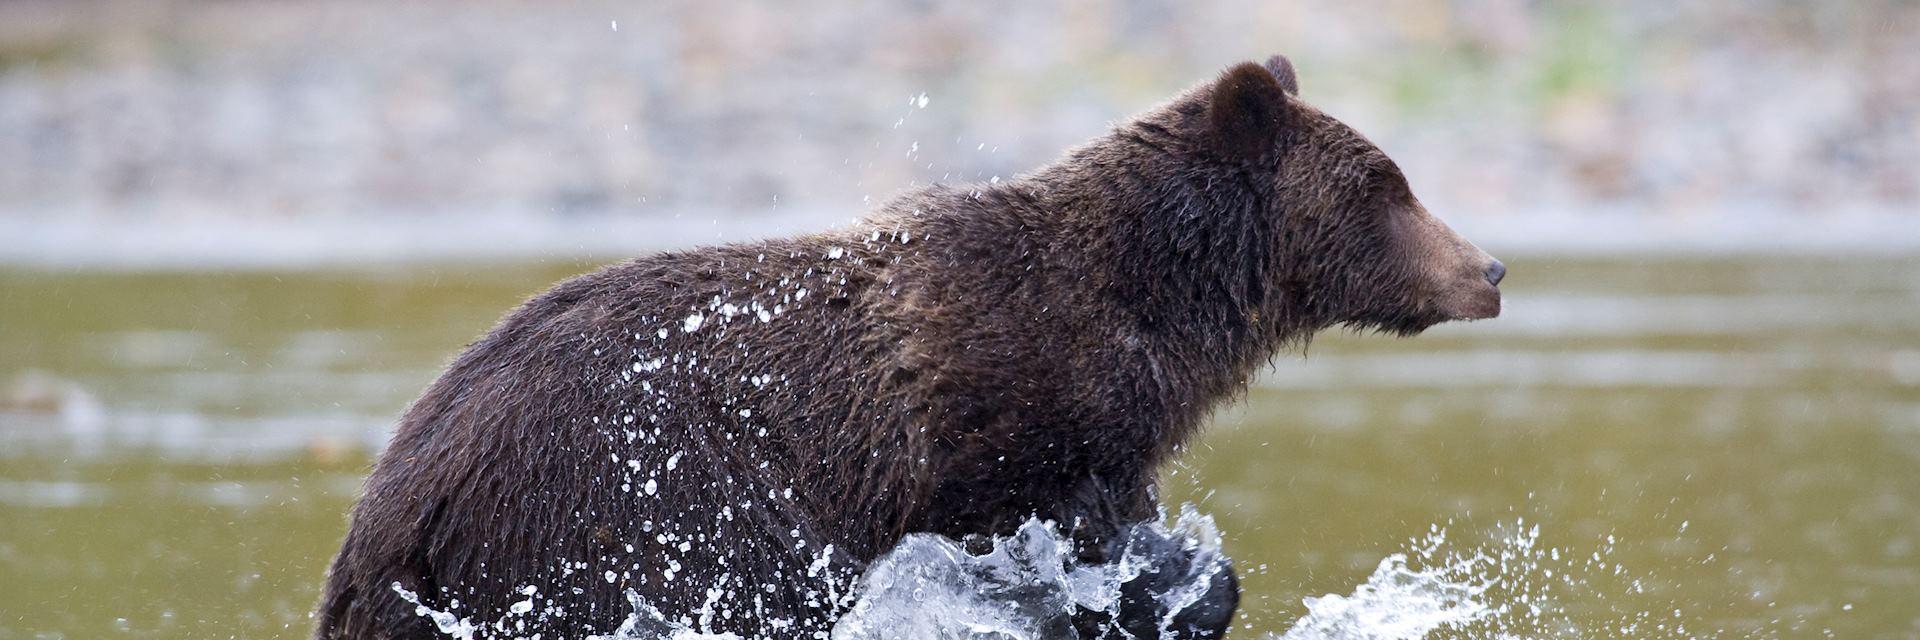 Grizzly bear, Yoho National Park, Canada